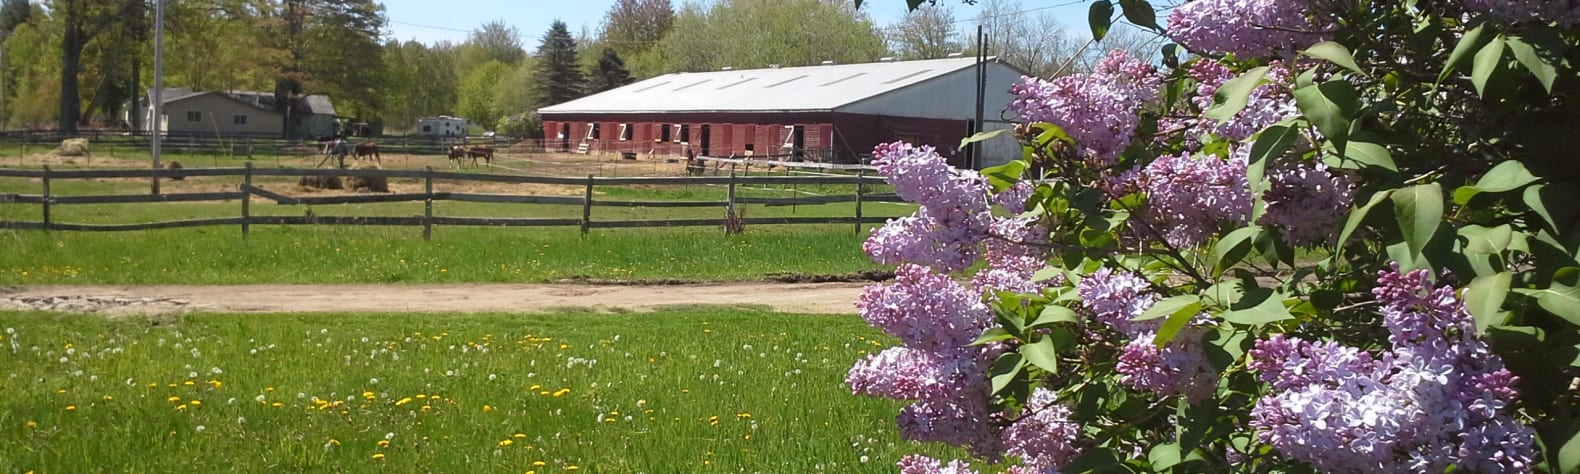 Double J Ranch Horse/Hobby Farm